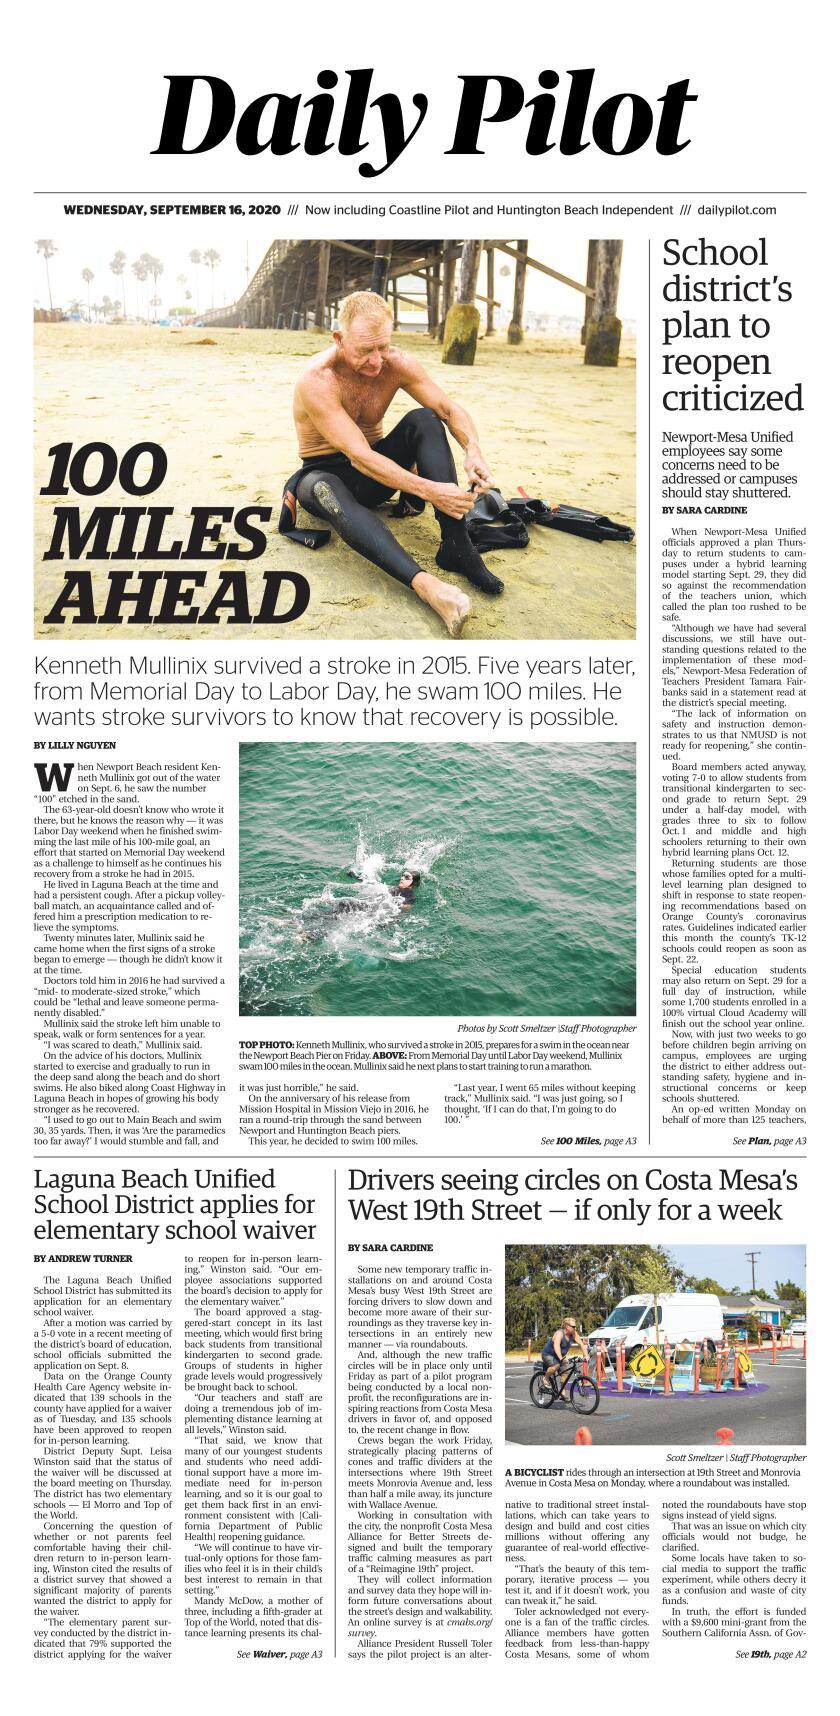 Wednesday's Daily Pilot cover.